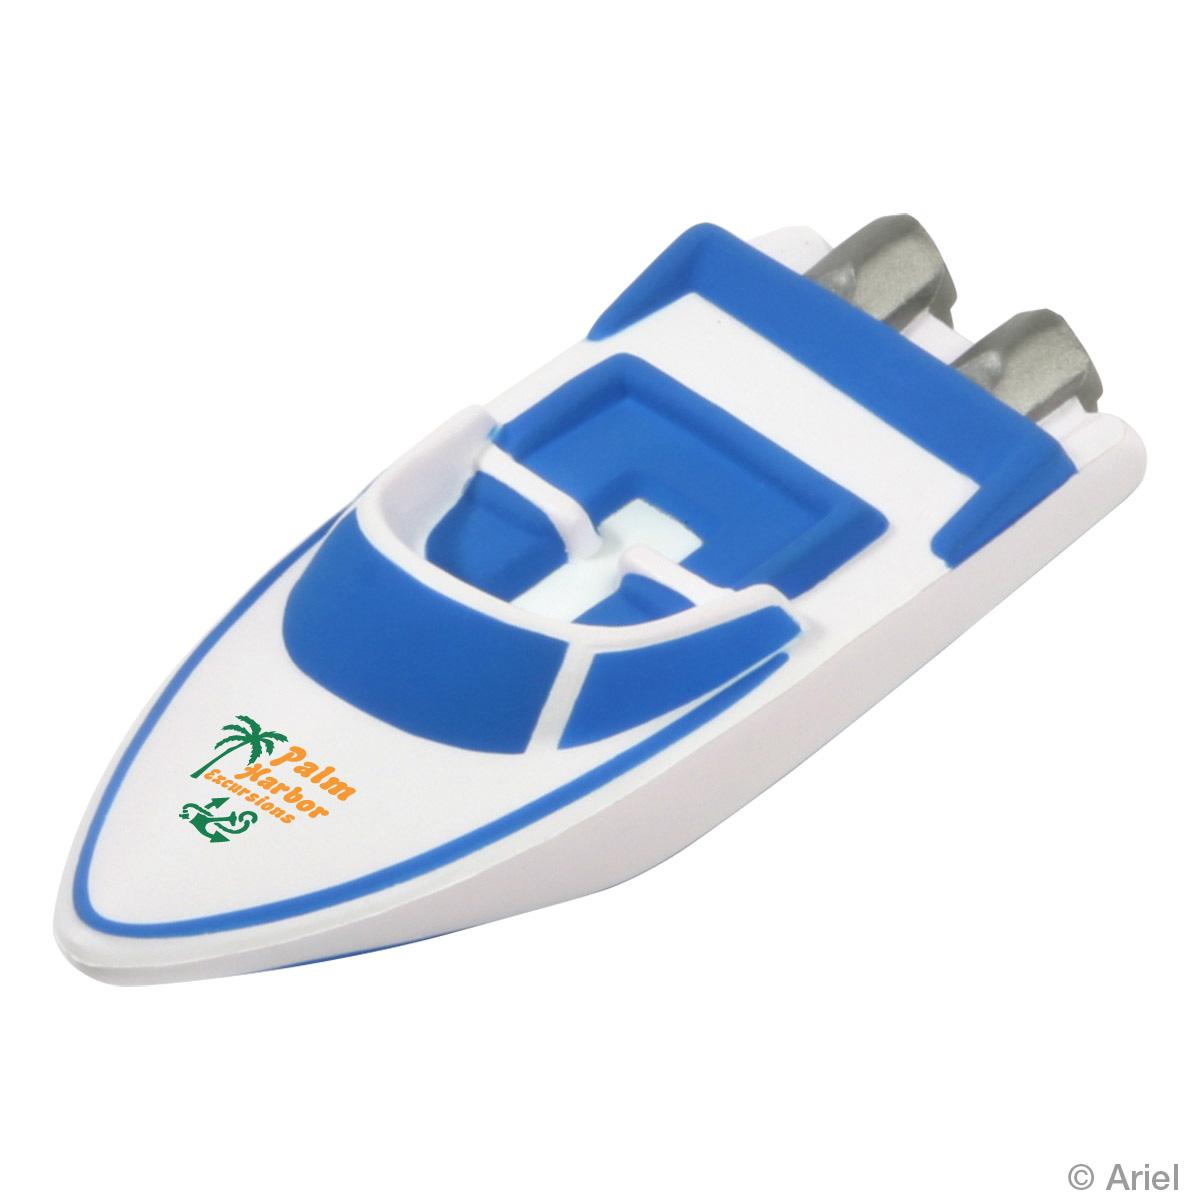 Speedboat Stress Reliever, LTV-SP07, 1 Colour Imprint